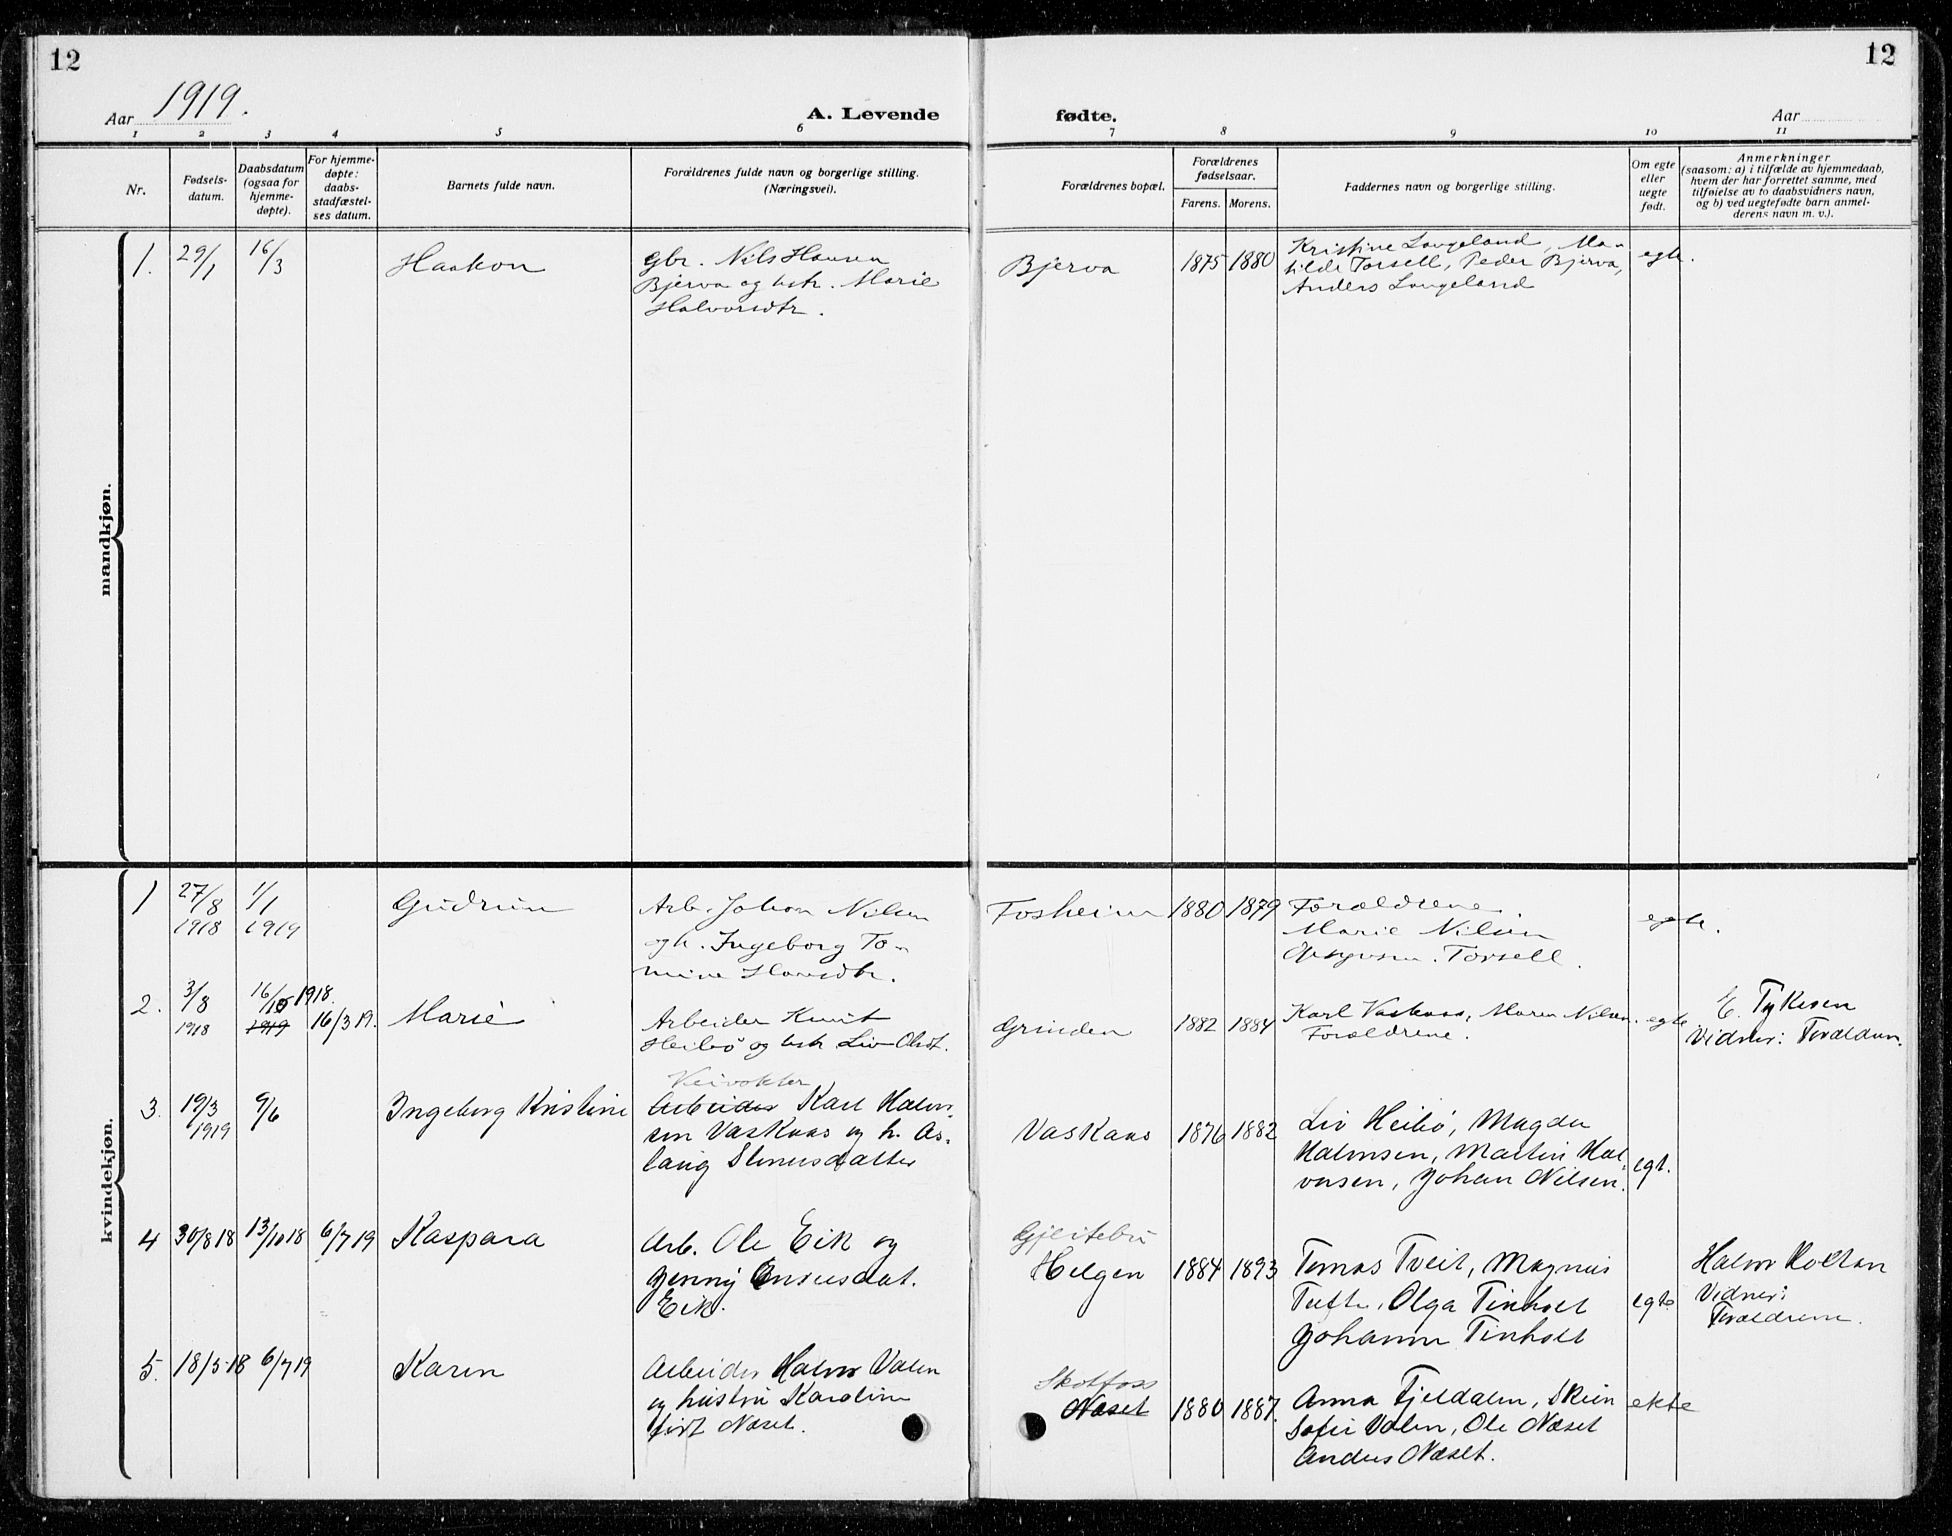 SAKO, Holla kirkebøker, G/Gb/L0003: Klokkerbok nr. II 3, 1914-1941, s. 12